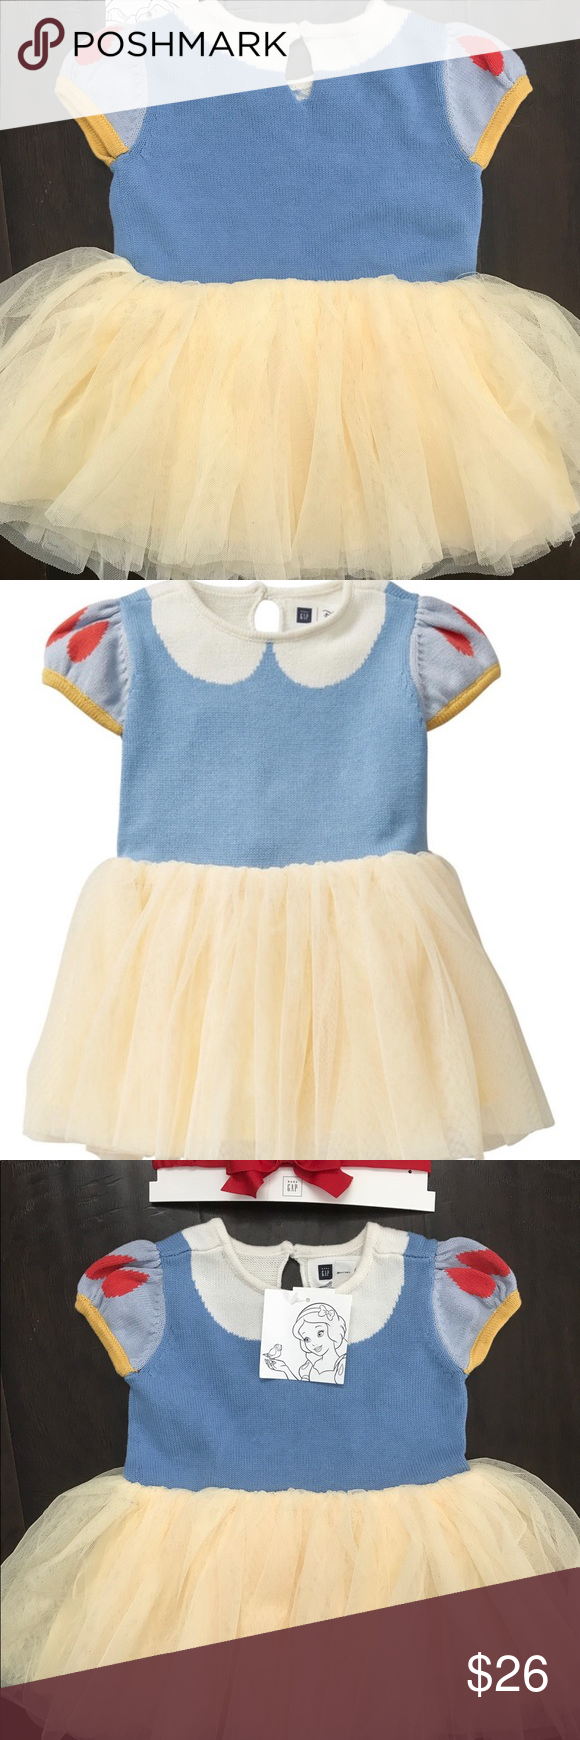 7116e87c7ae7 Disney for Baby Gap Snow White Dress and Headband Disney for Baby ...